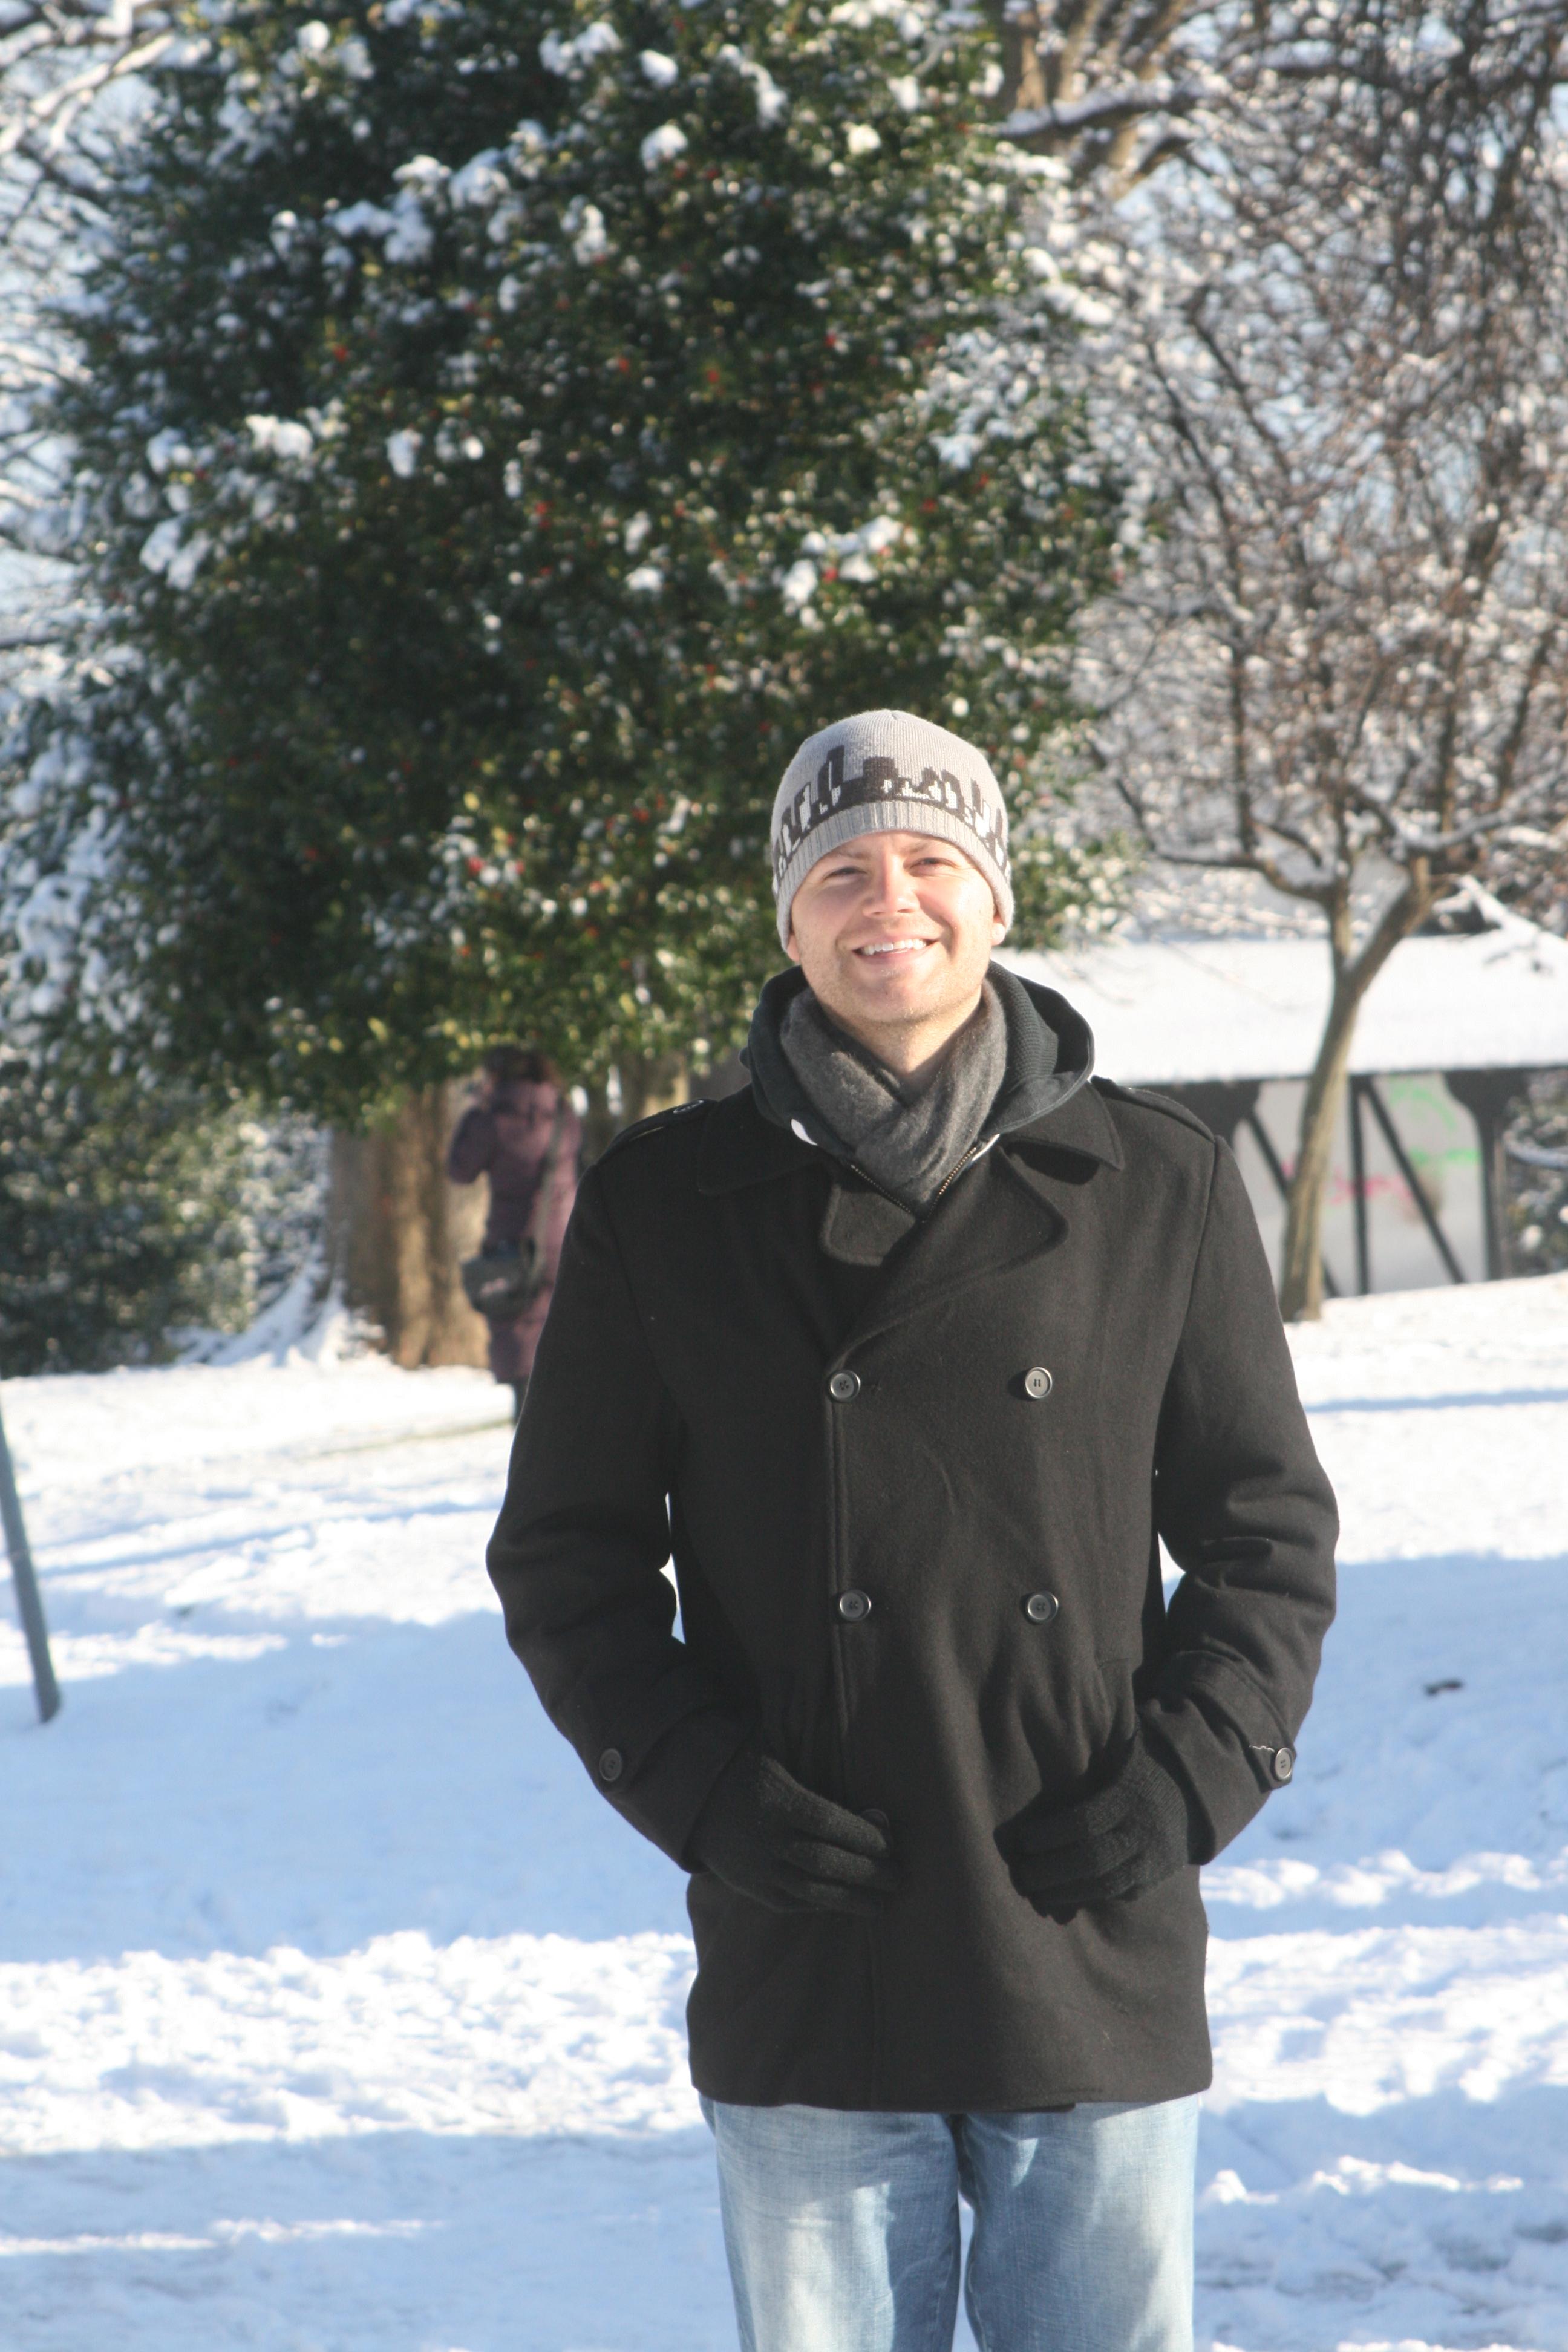 Smurfit MBA student Patrick Hillis in snowy Blackrock Park